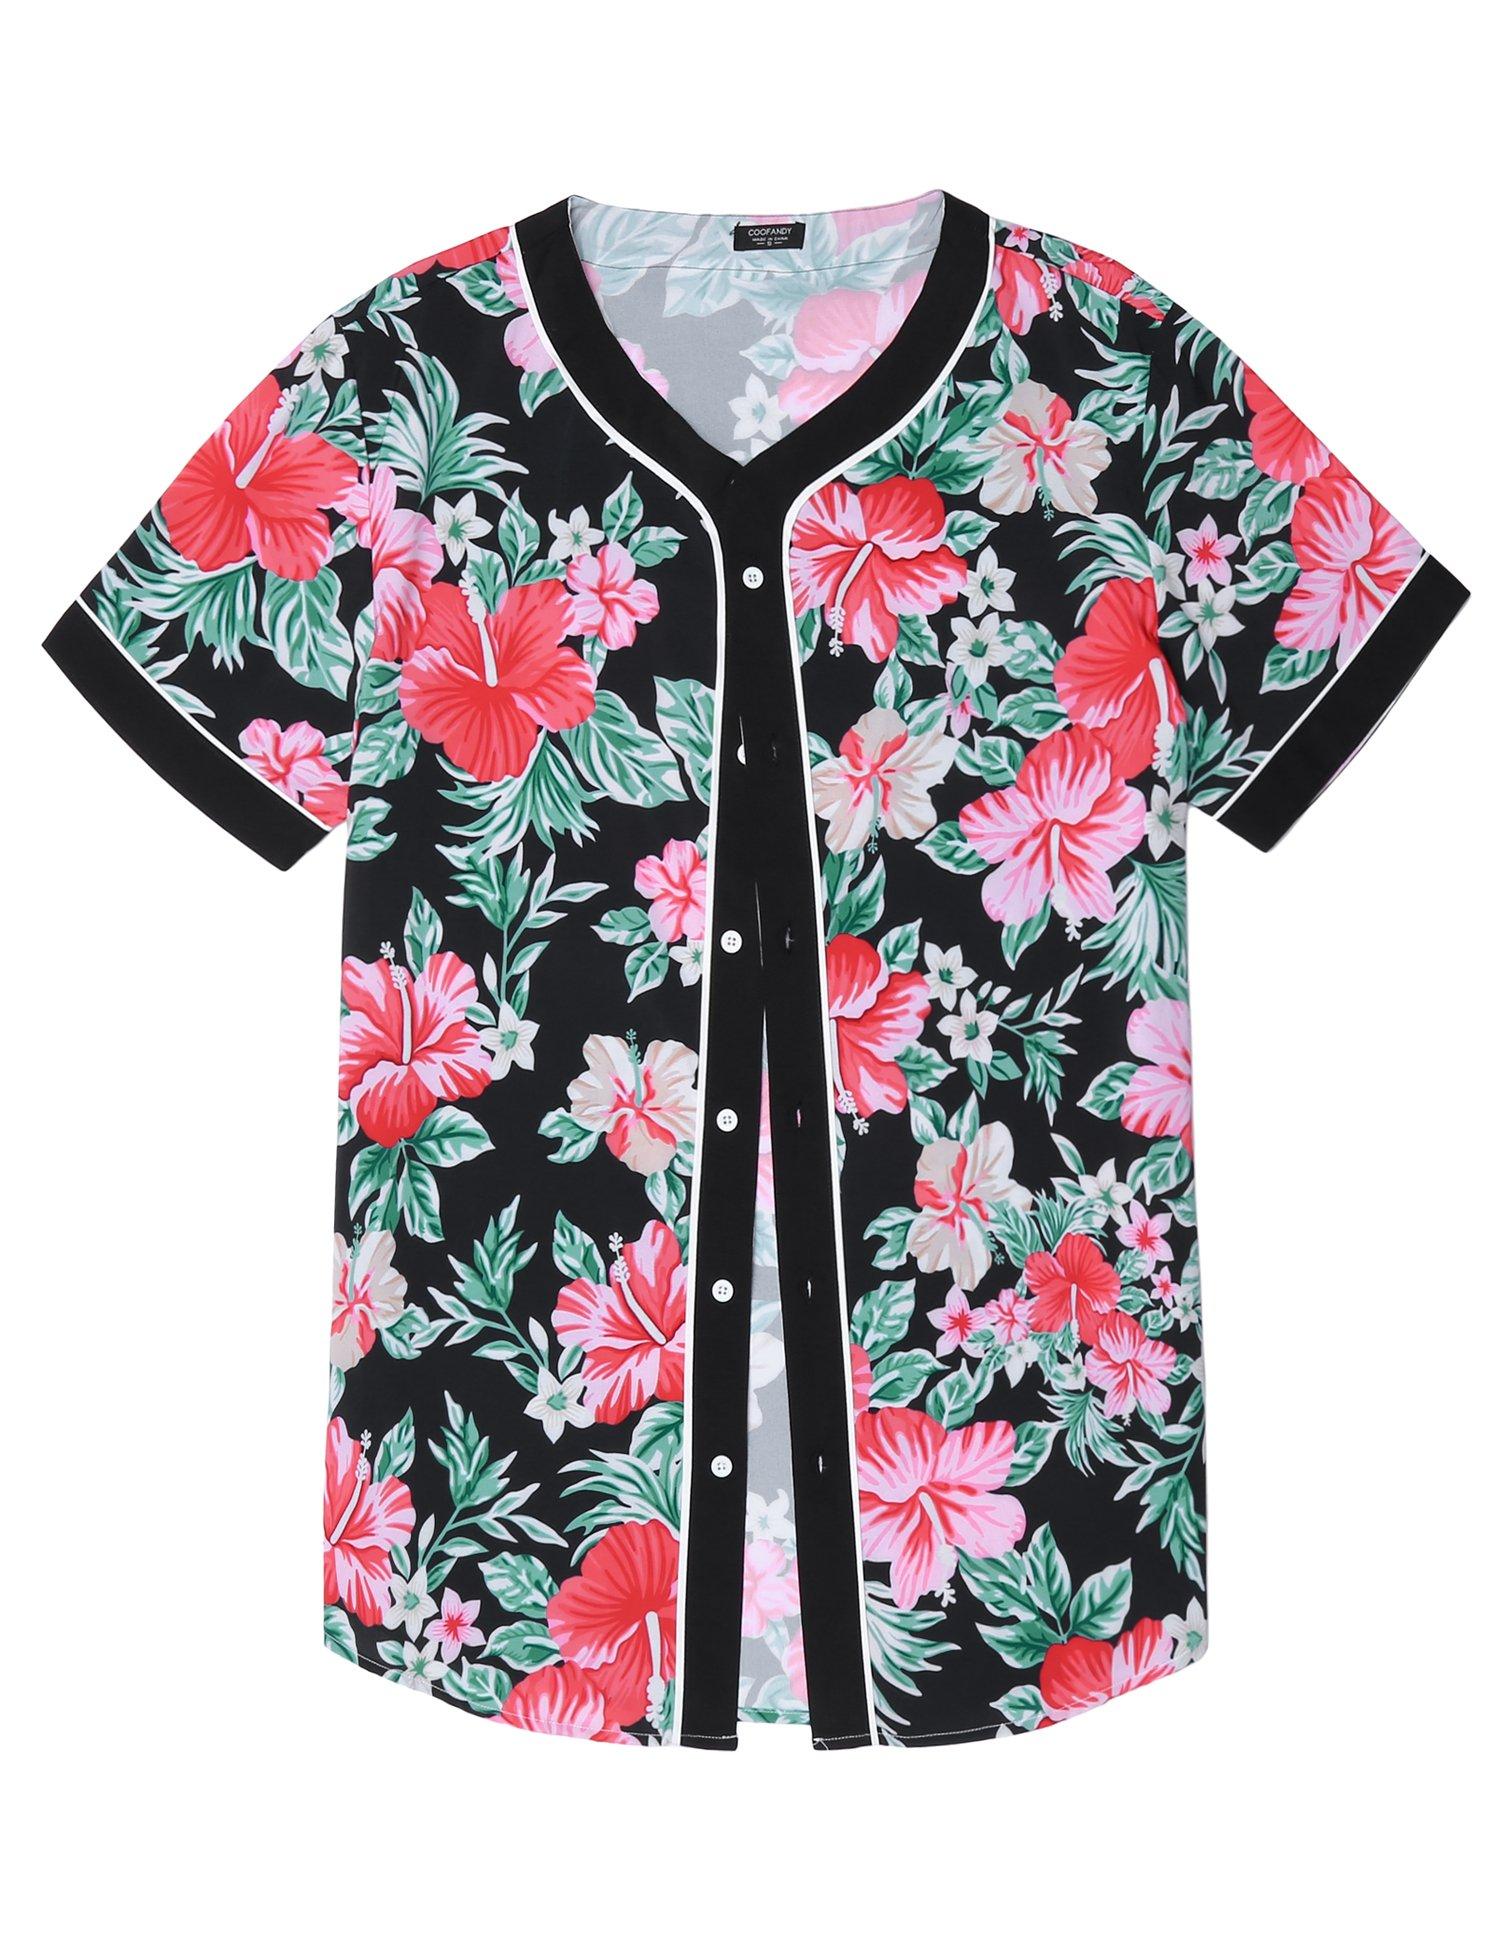 COOFANDY Mens Casual Floral Print Hip Hop Button Down Baseball Jersey Shirts, Pat, Medium